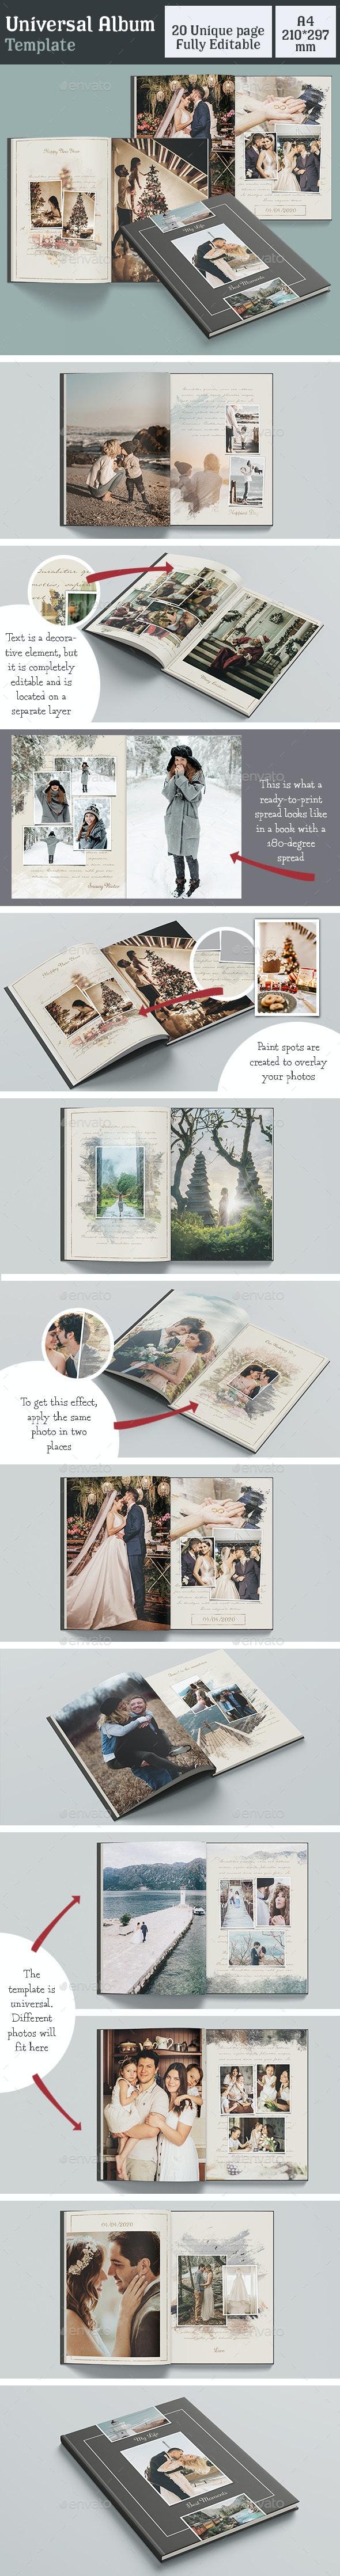 Universal Album Template - Photo Albums Print Templates